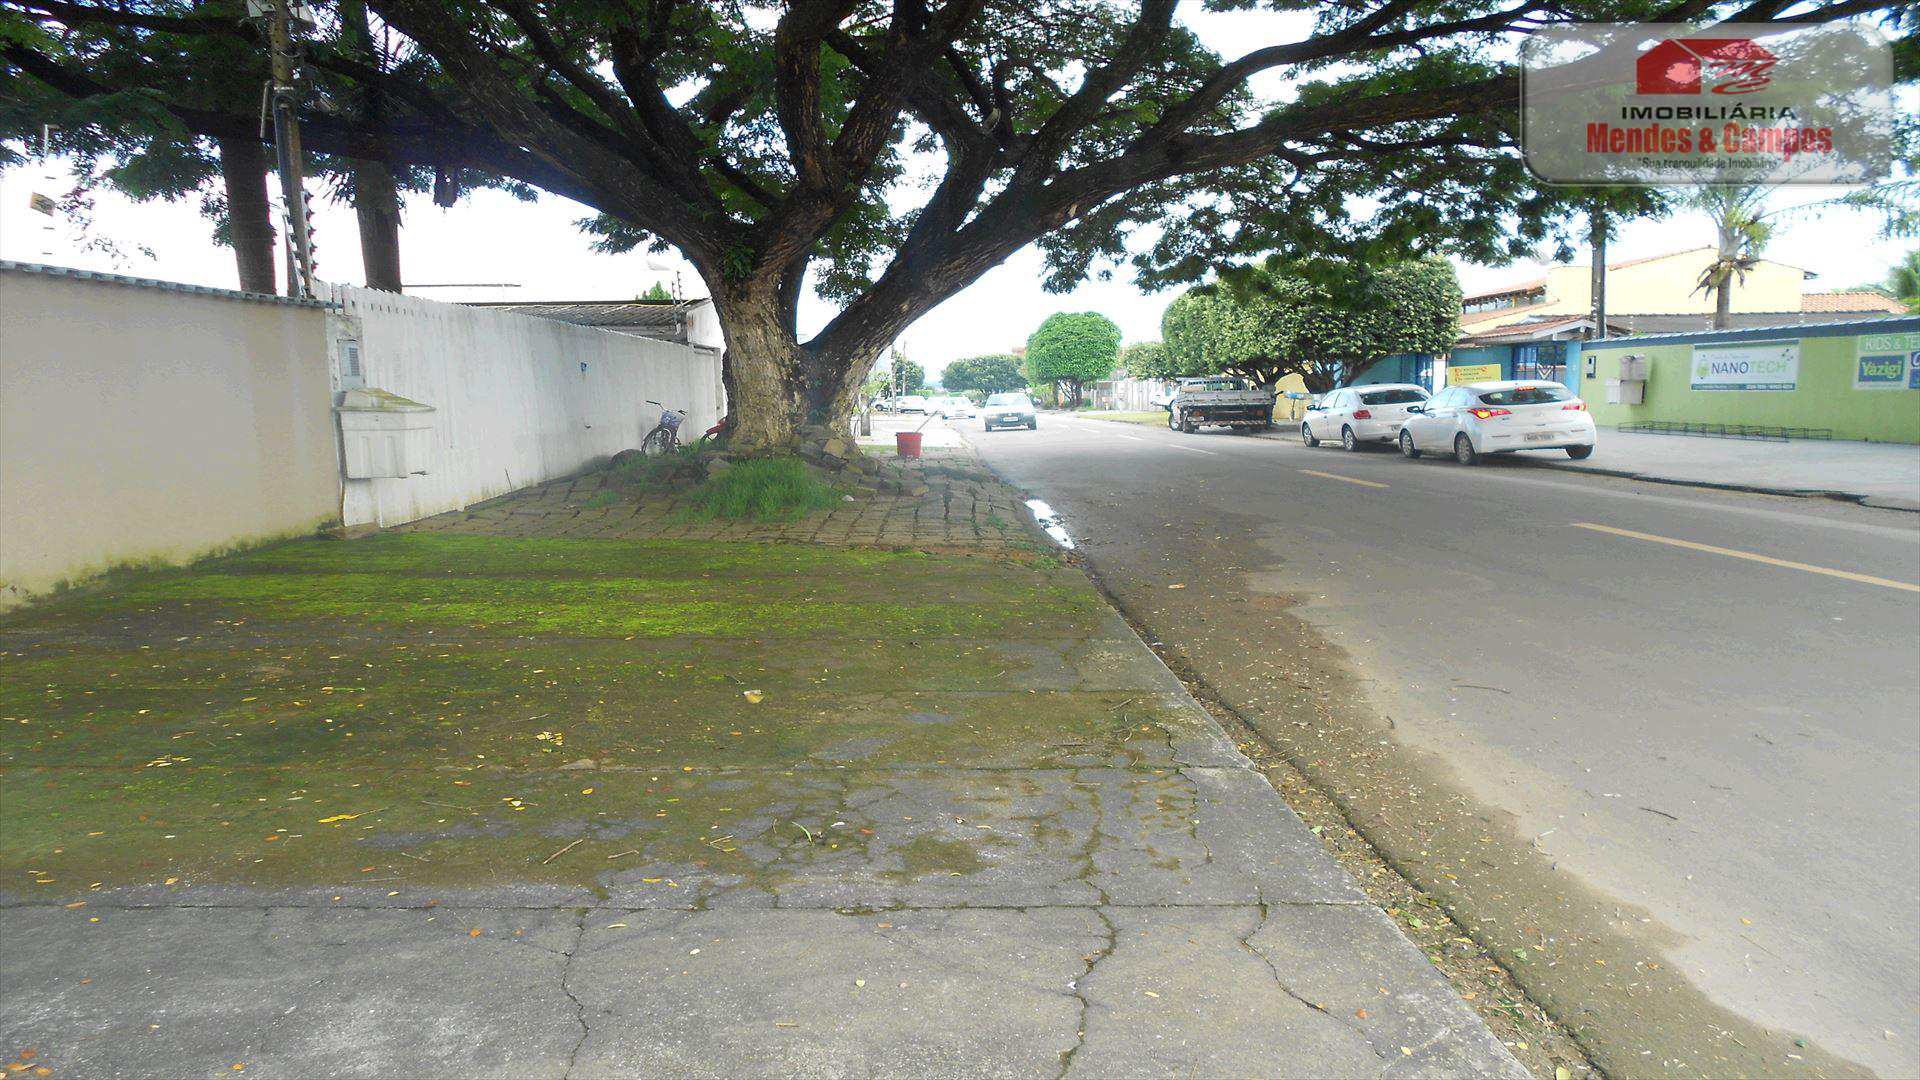 Terreno em Ariquemes bairro Setor 03